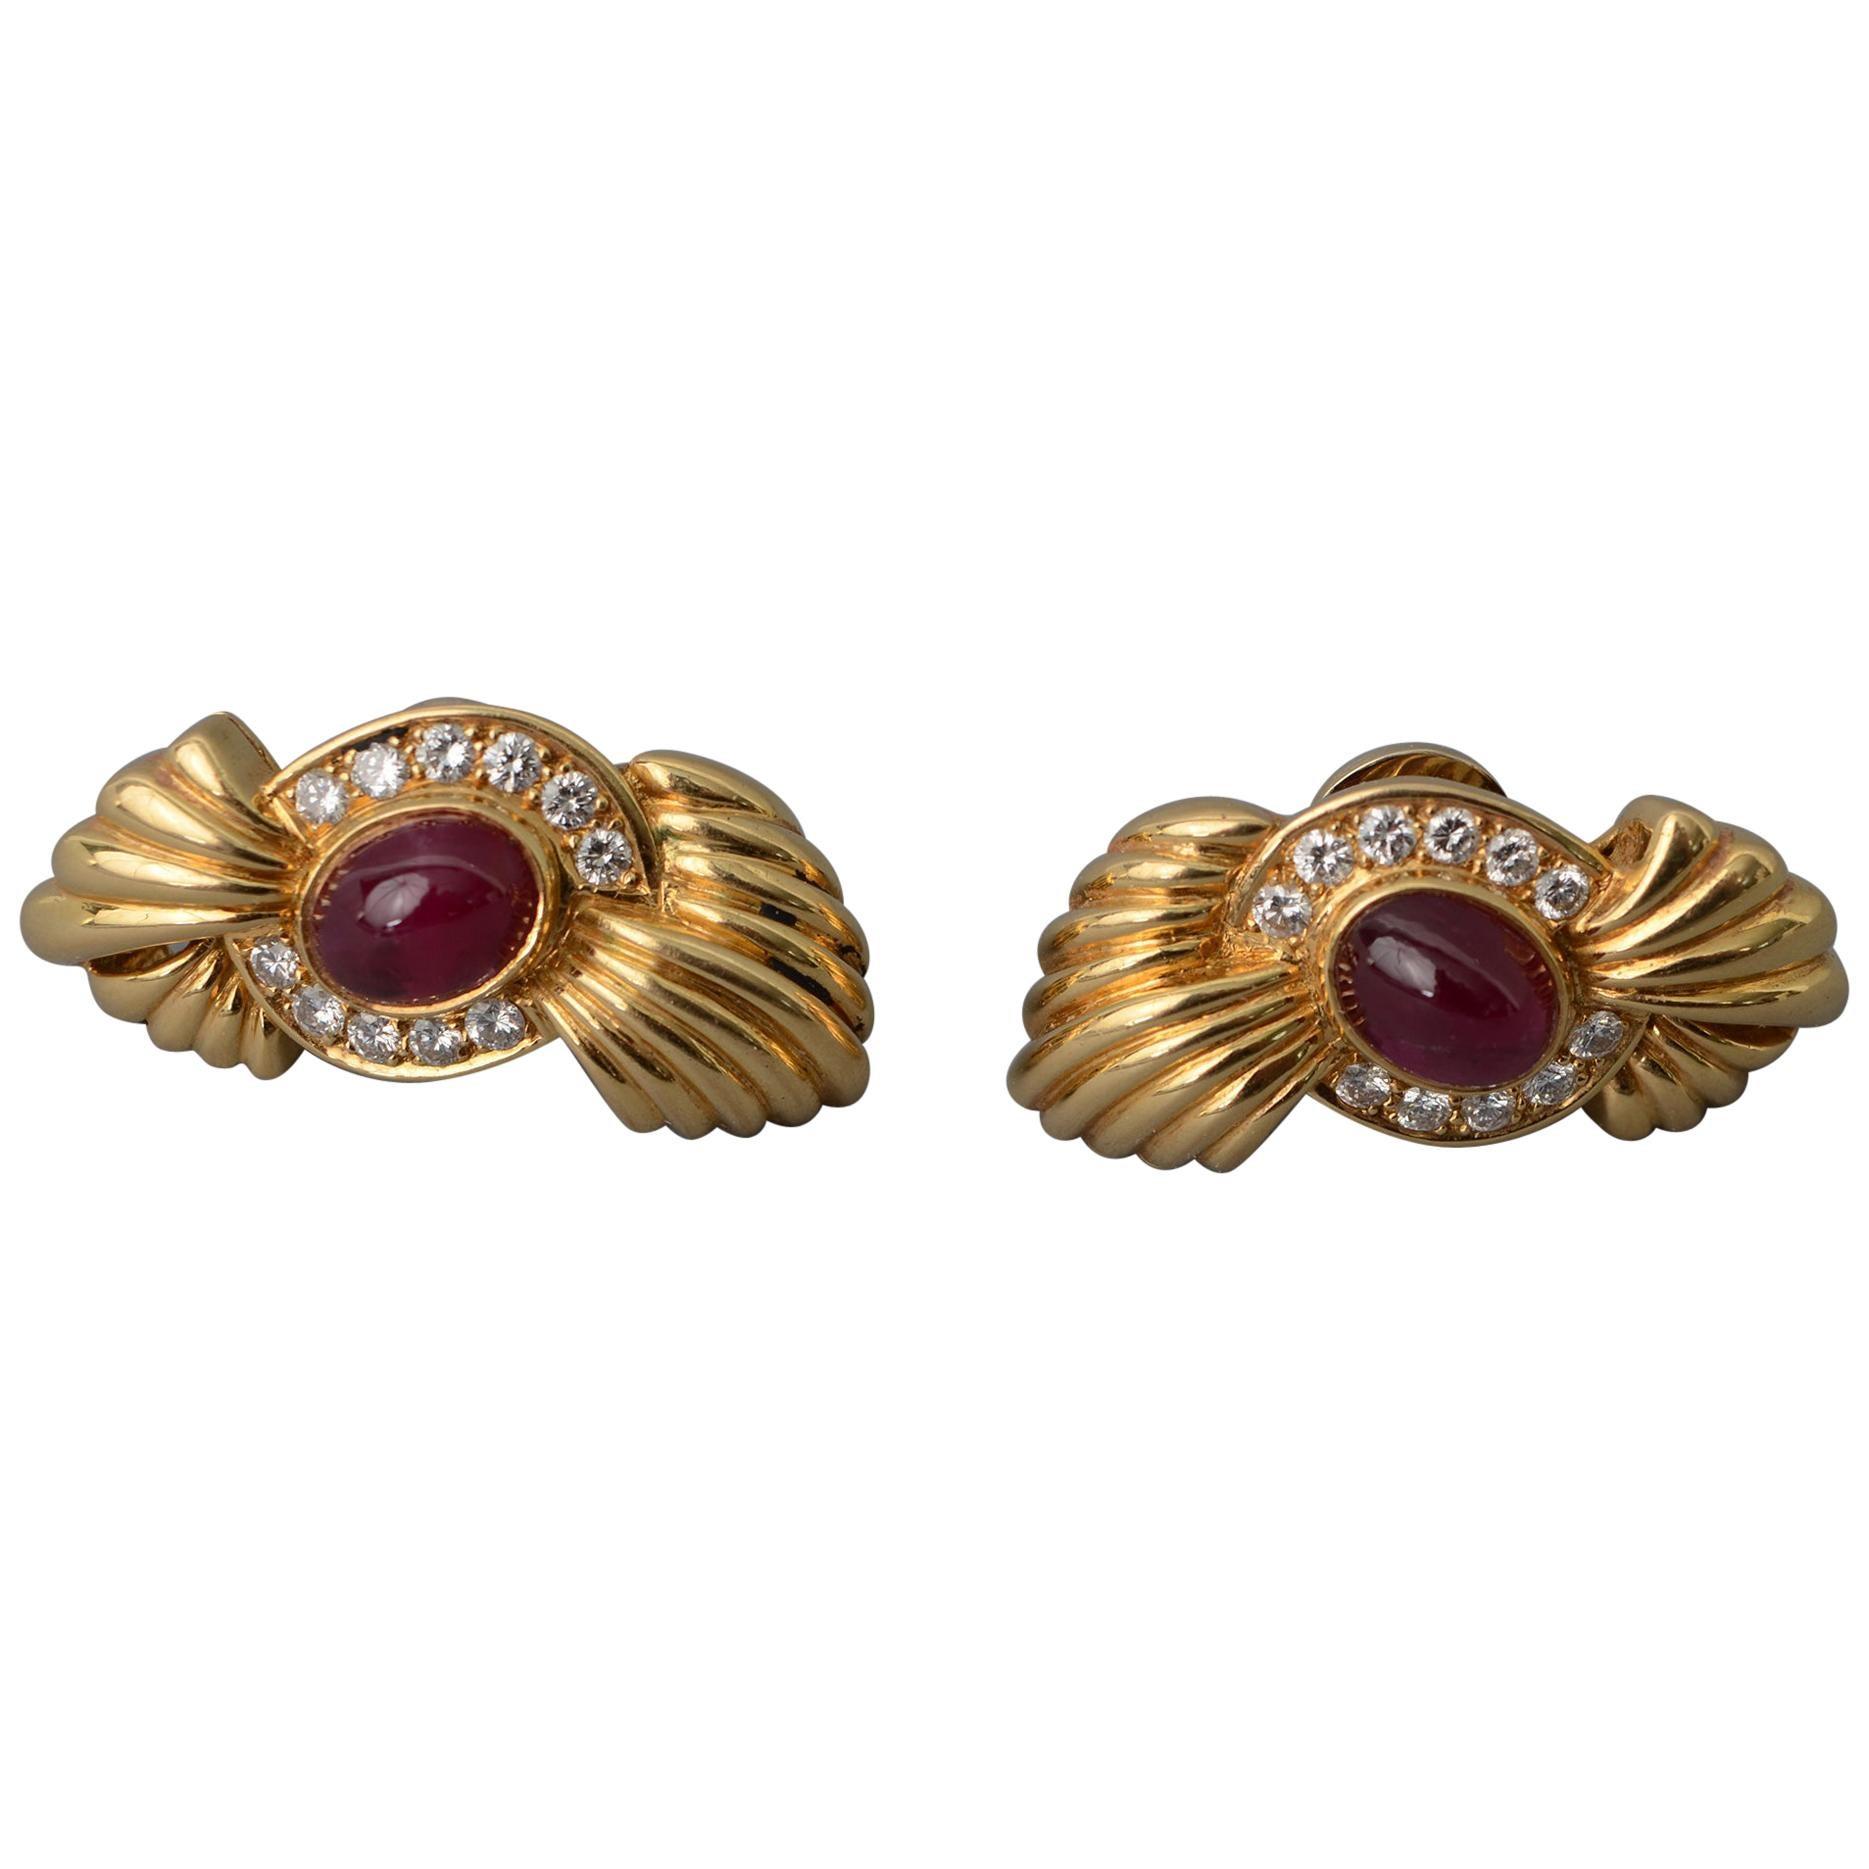 Fred Paris Ruby Diamond Earrings